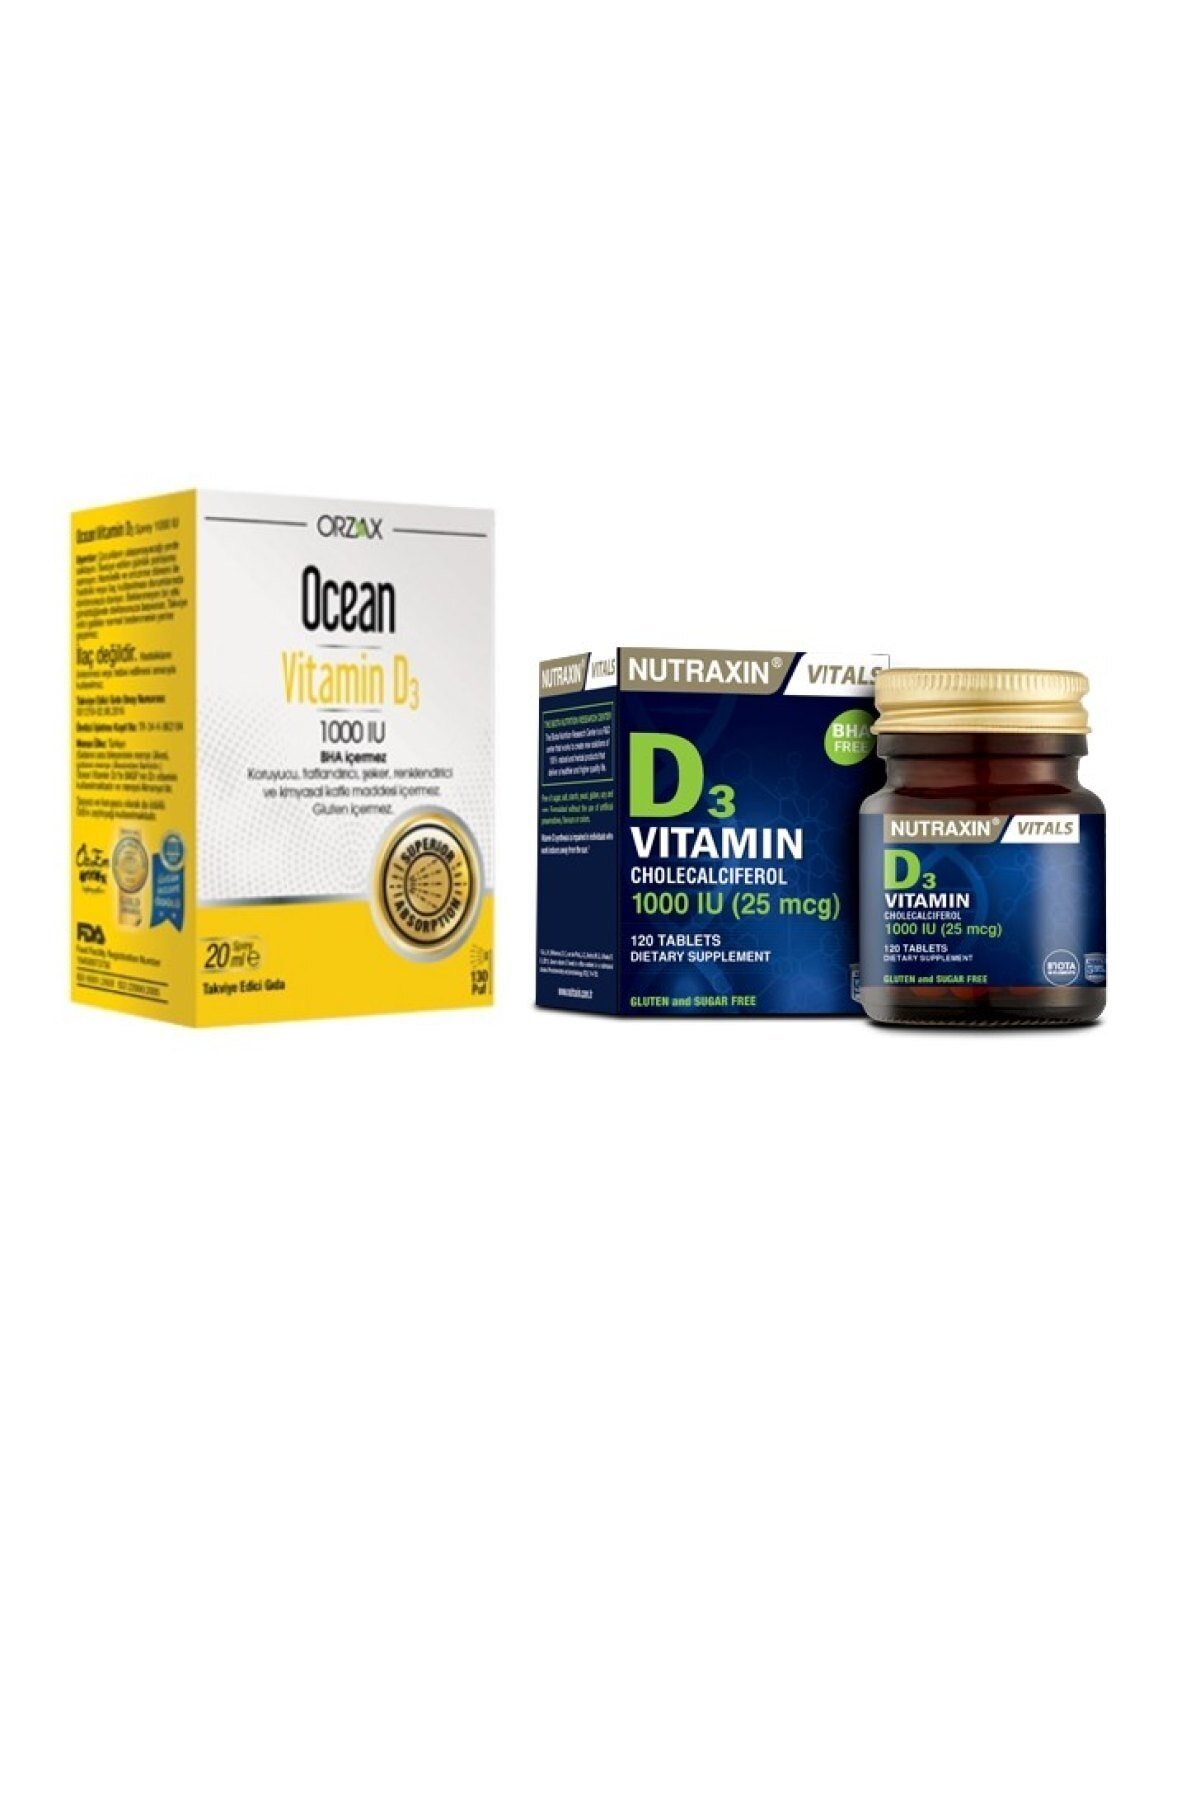 Orzax D Vitamin Seti D3 Vitamini 1000 Iu 120 Tablet D3 Vitamini Ocean Vitamin D3 1000 Iu Sprey 20 Ml Fiyati Yorumlari Trendyol